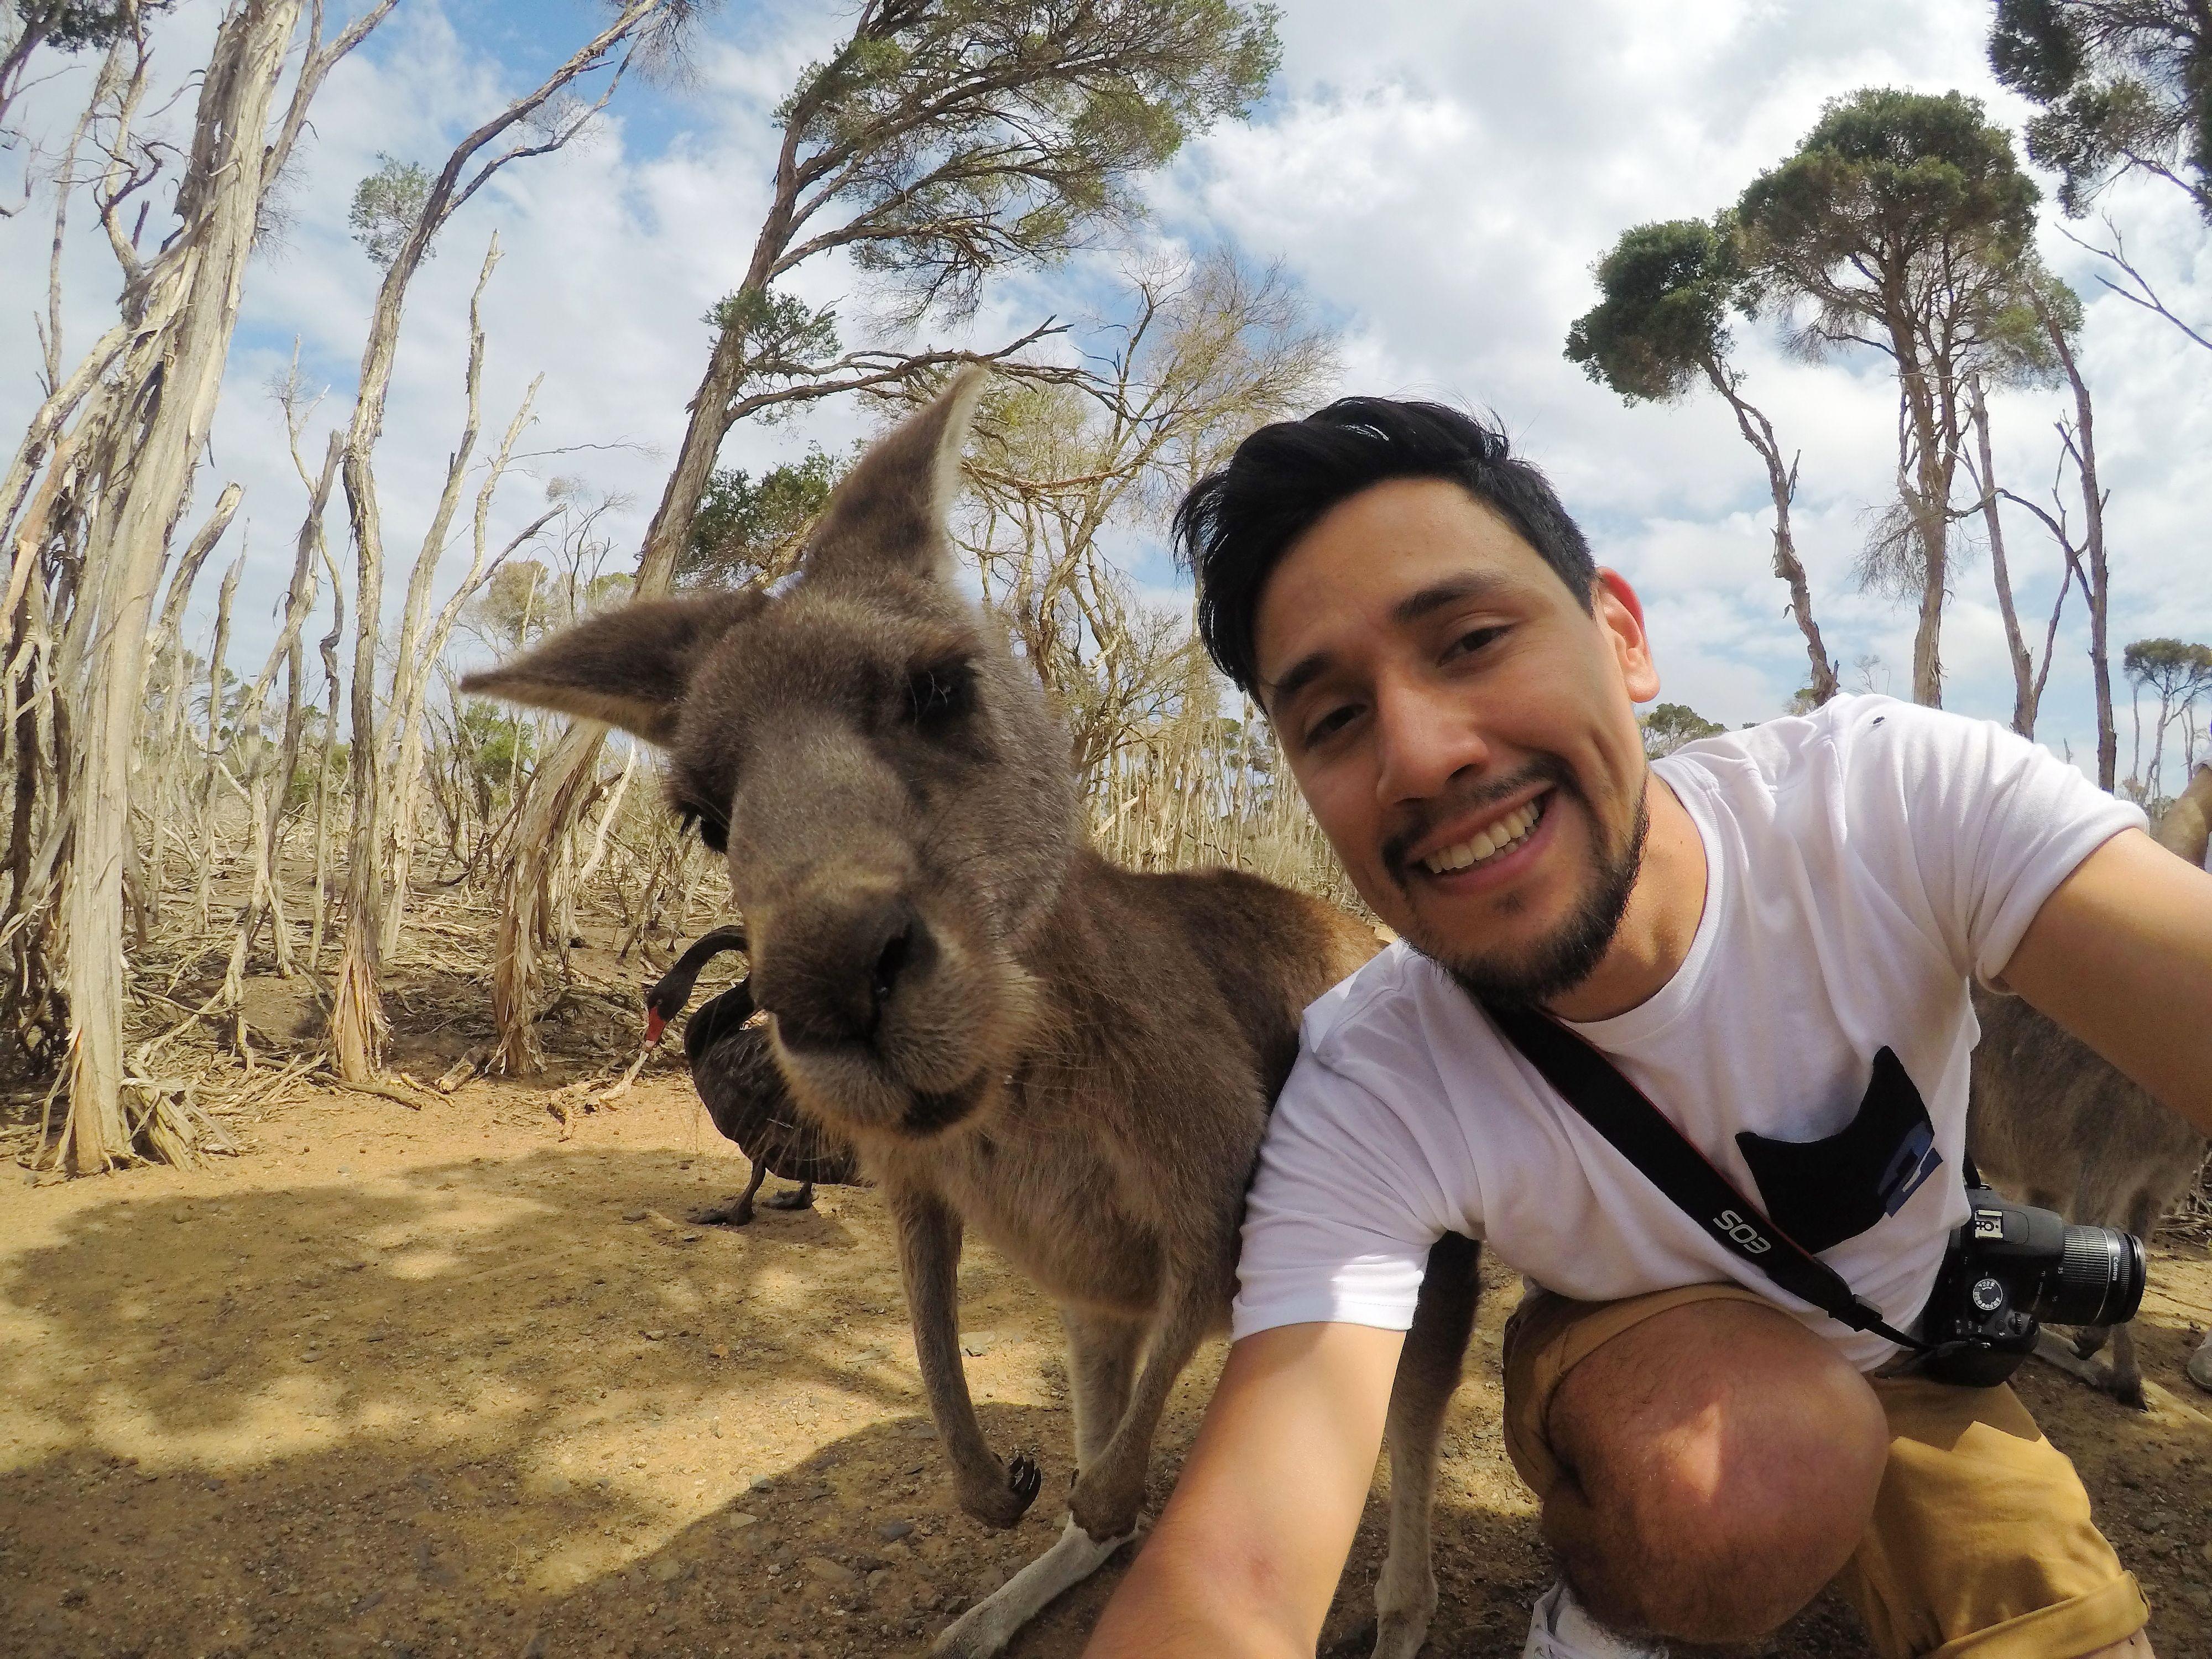 selfie with kangaroo